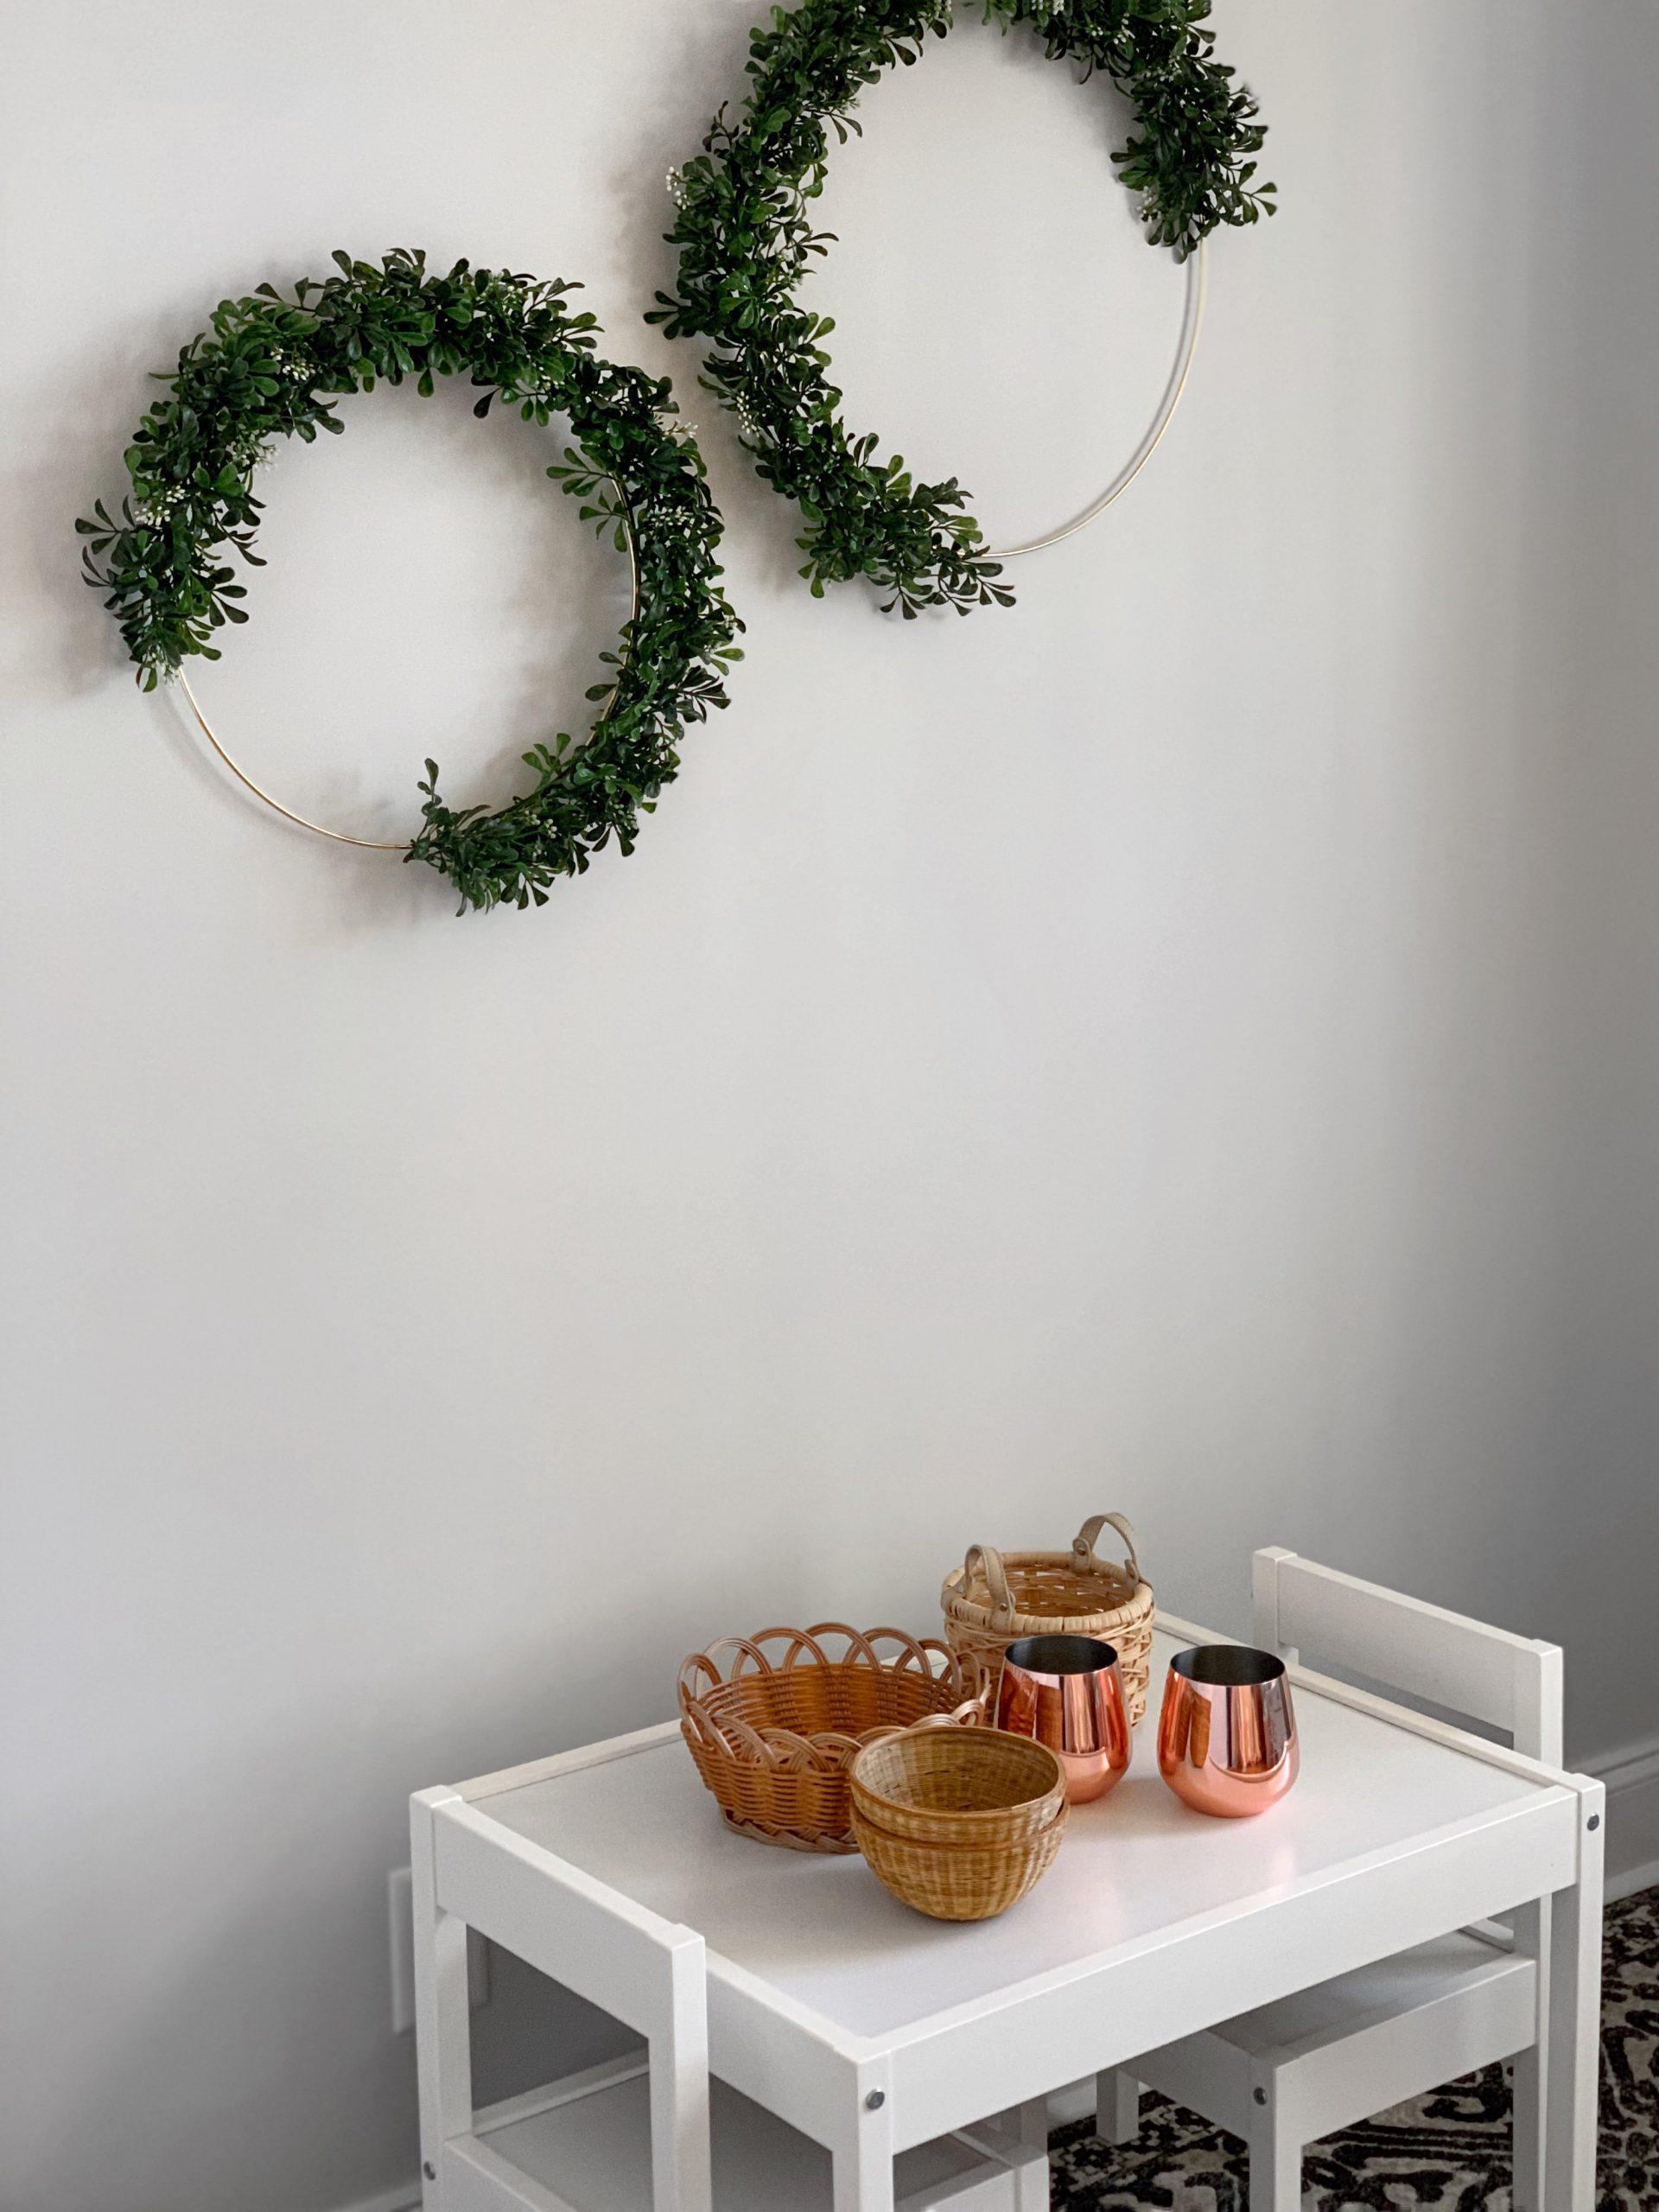 The Easiest DIY Gold Hoop and Greenery Wreath